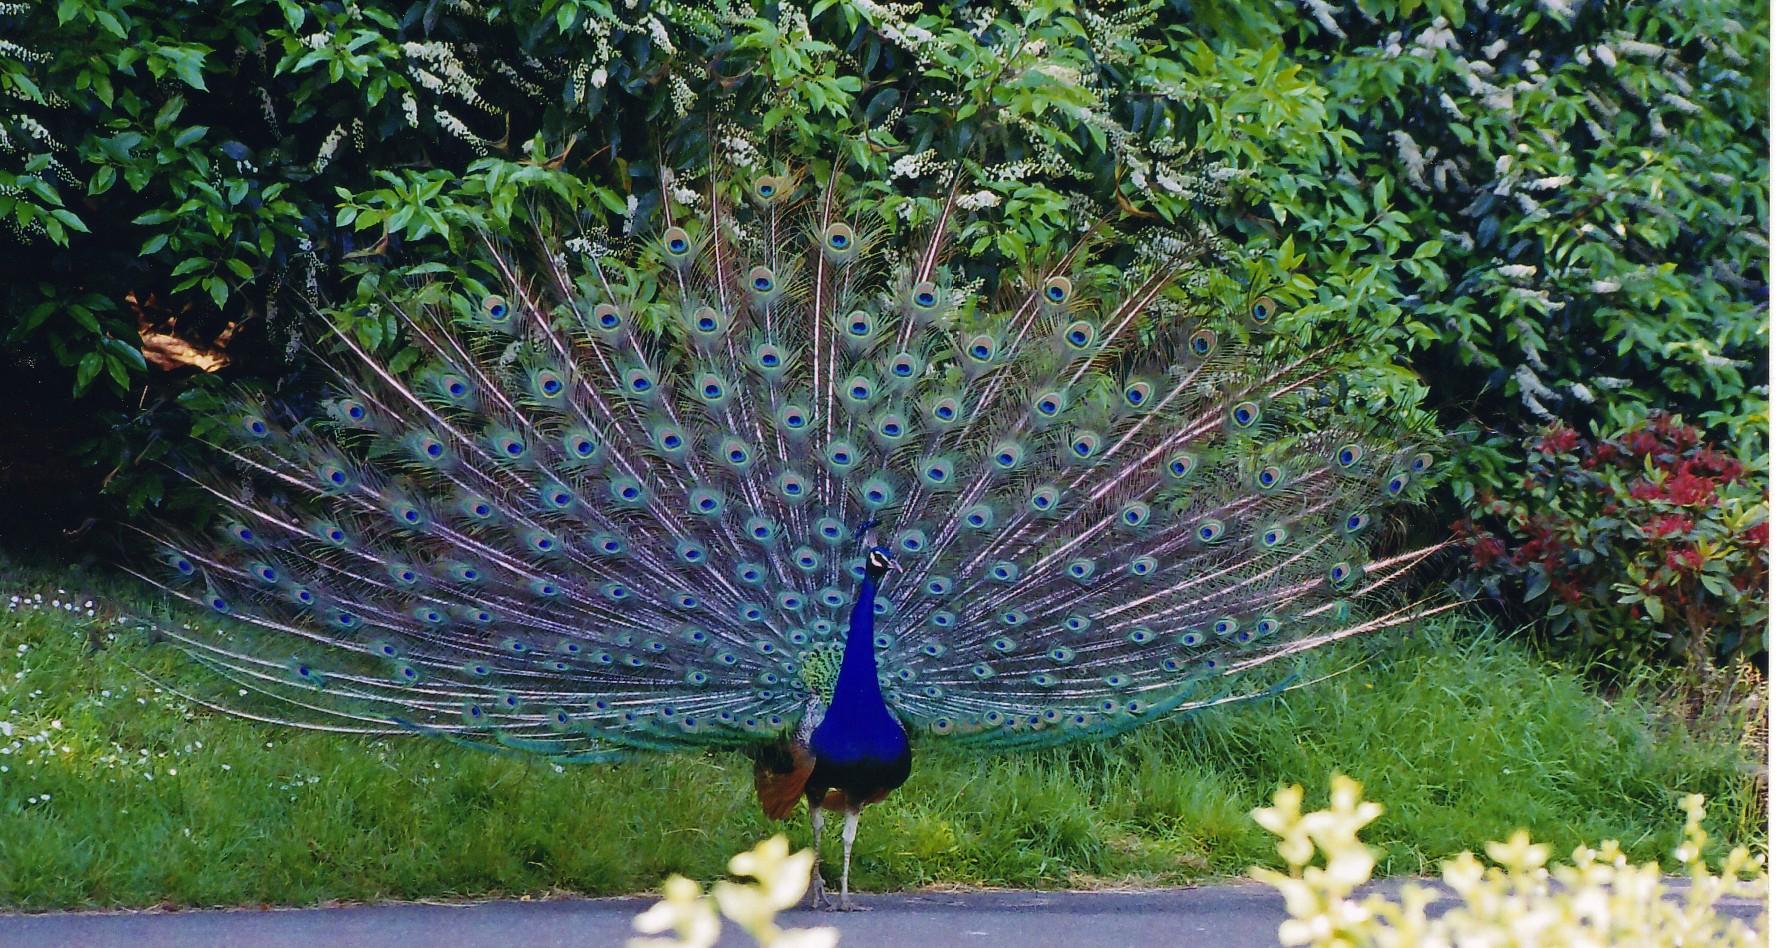 Beautiful Place To See Near The Mukteswara Temple, Haveri-Bankapura Peacock Sanctuary